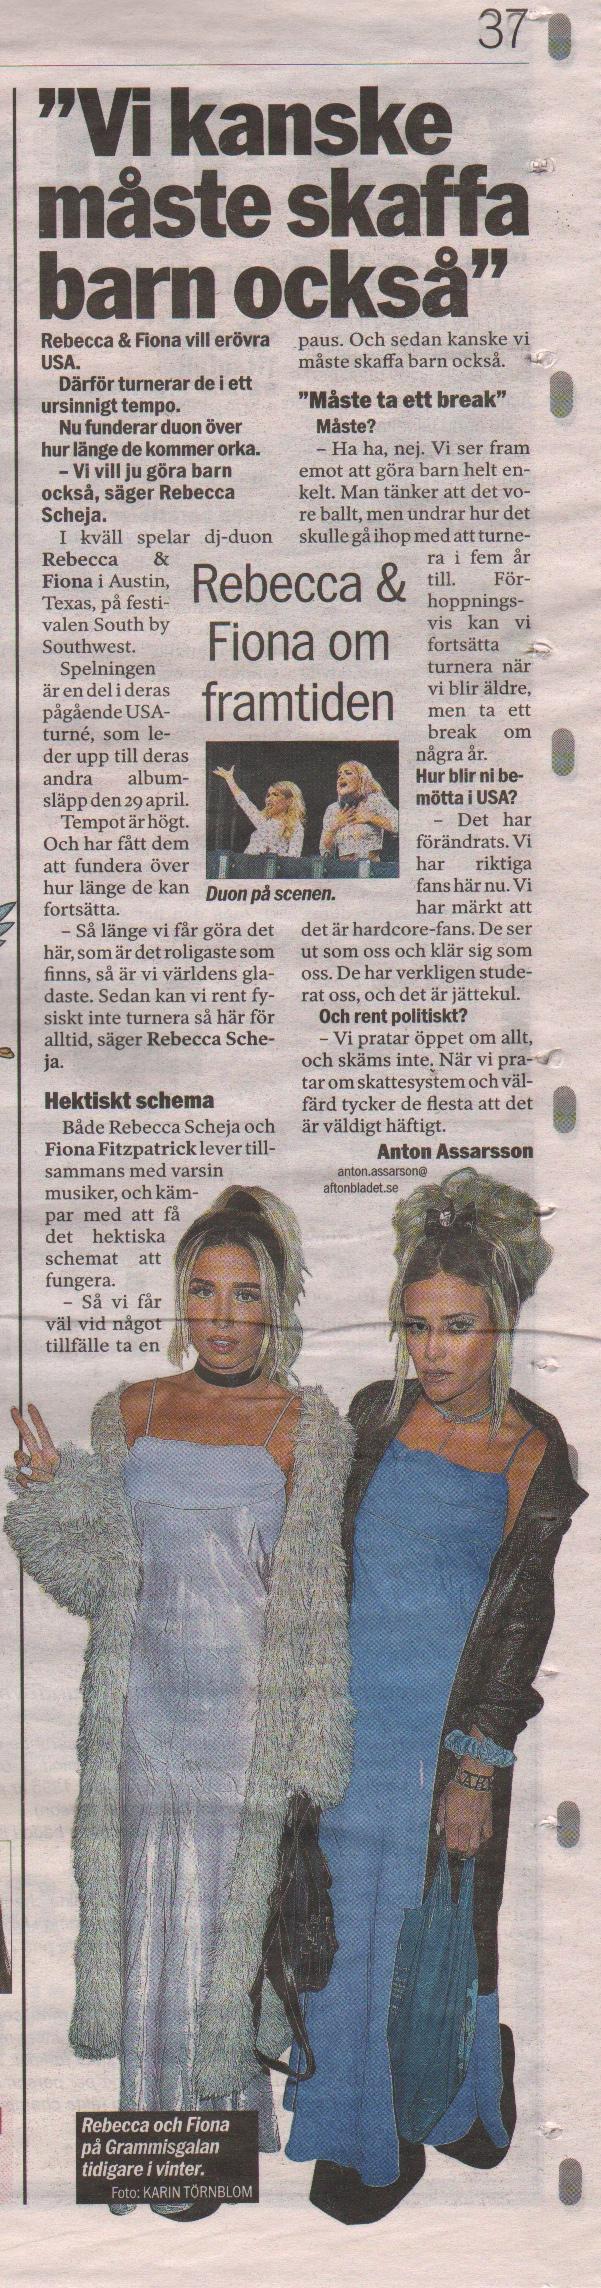 sxsw-Aftonbladet-RF.jpg